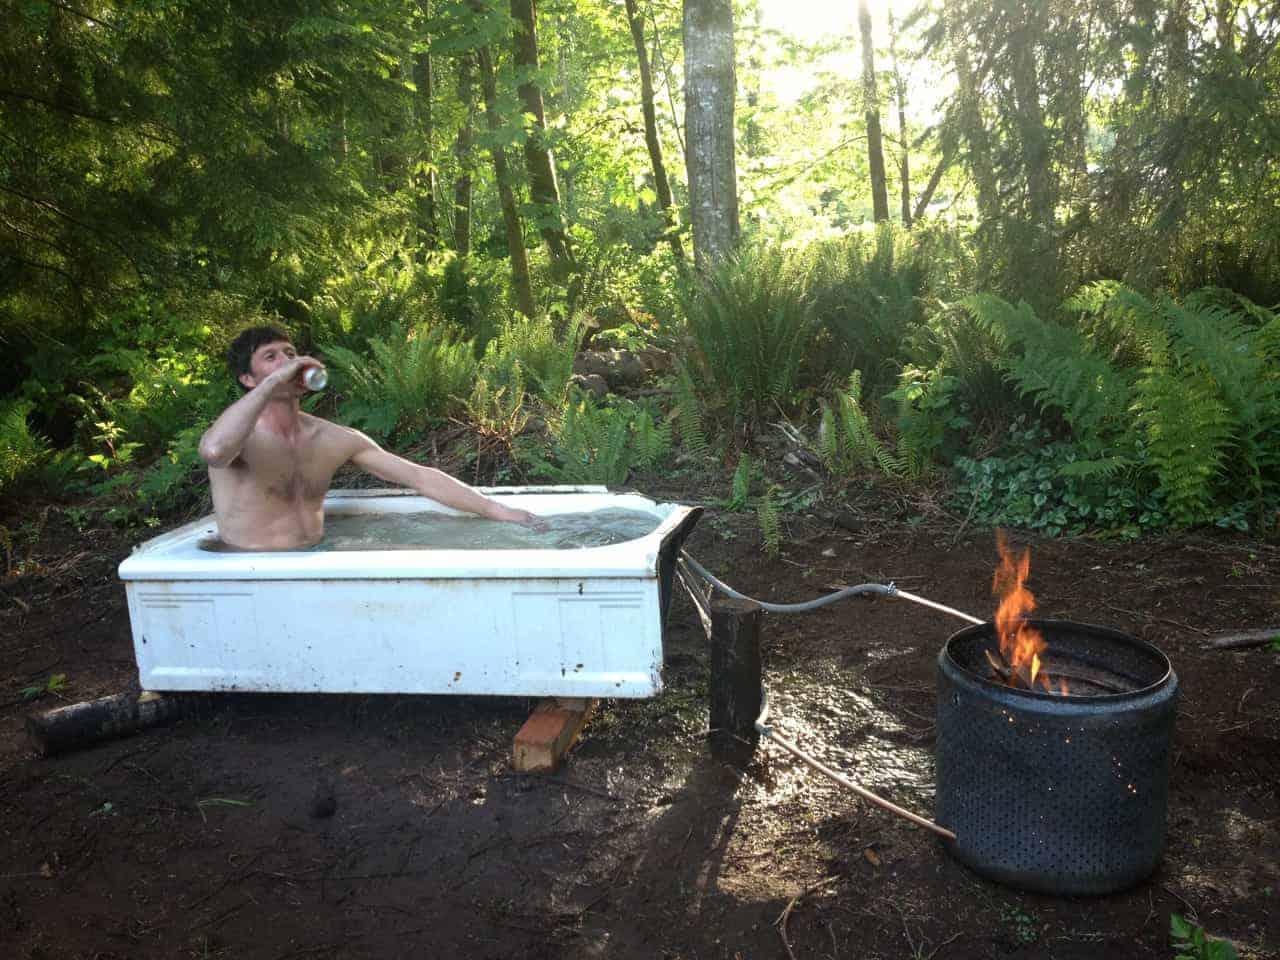 Building a Backcountry Hot Tub – Teton Gravity Research